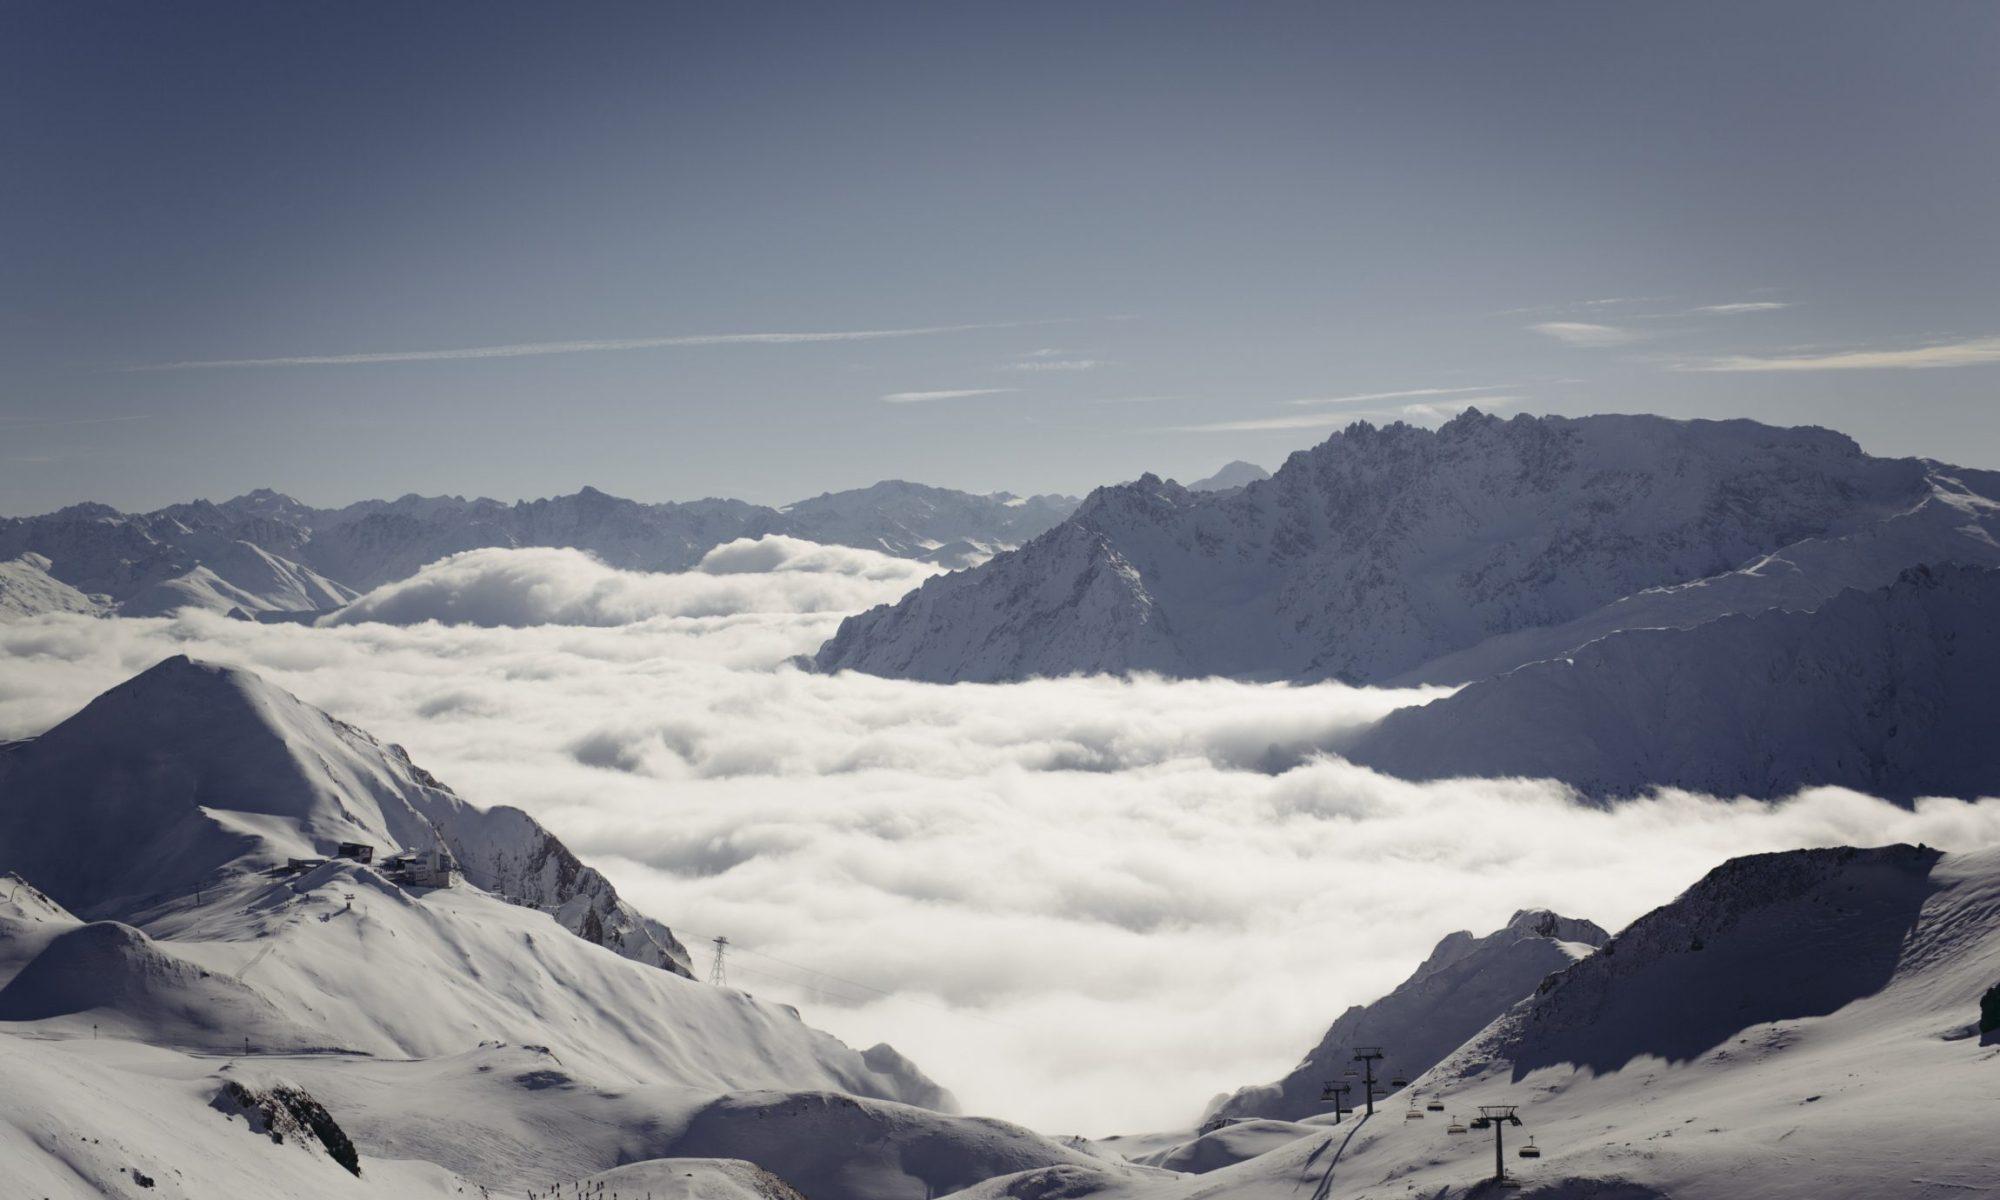 Ischgl - Copyright: Tirol Werbung- Jarisch Manfred. News from the Tirol's ski resorts 2018/19.